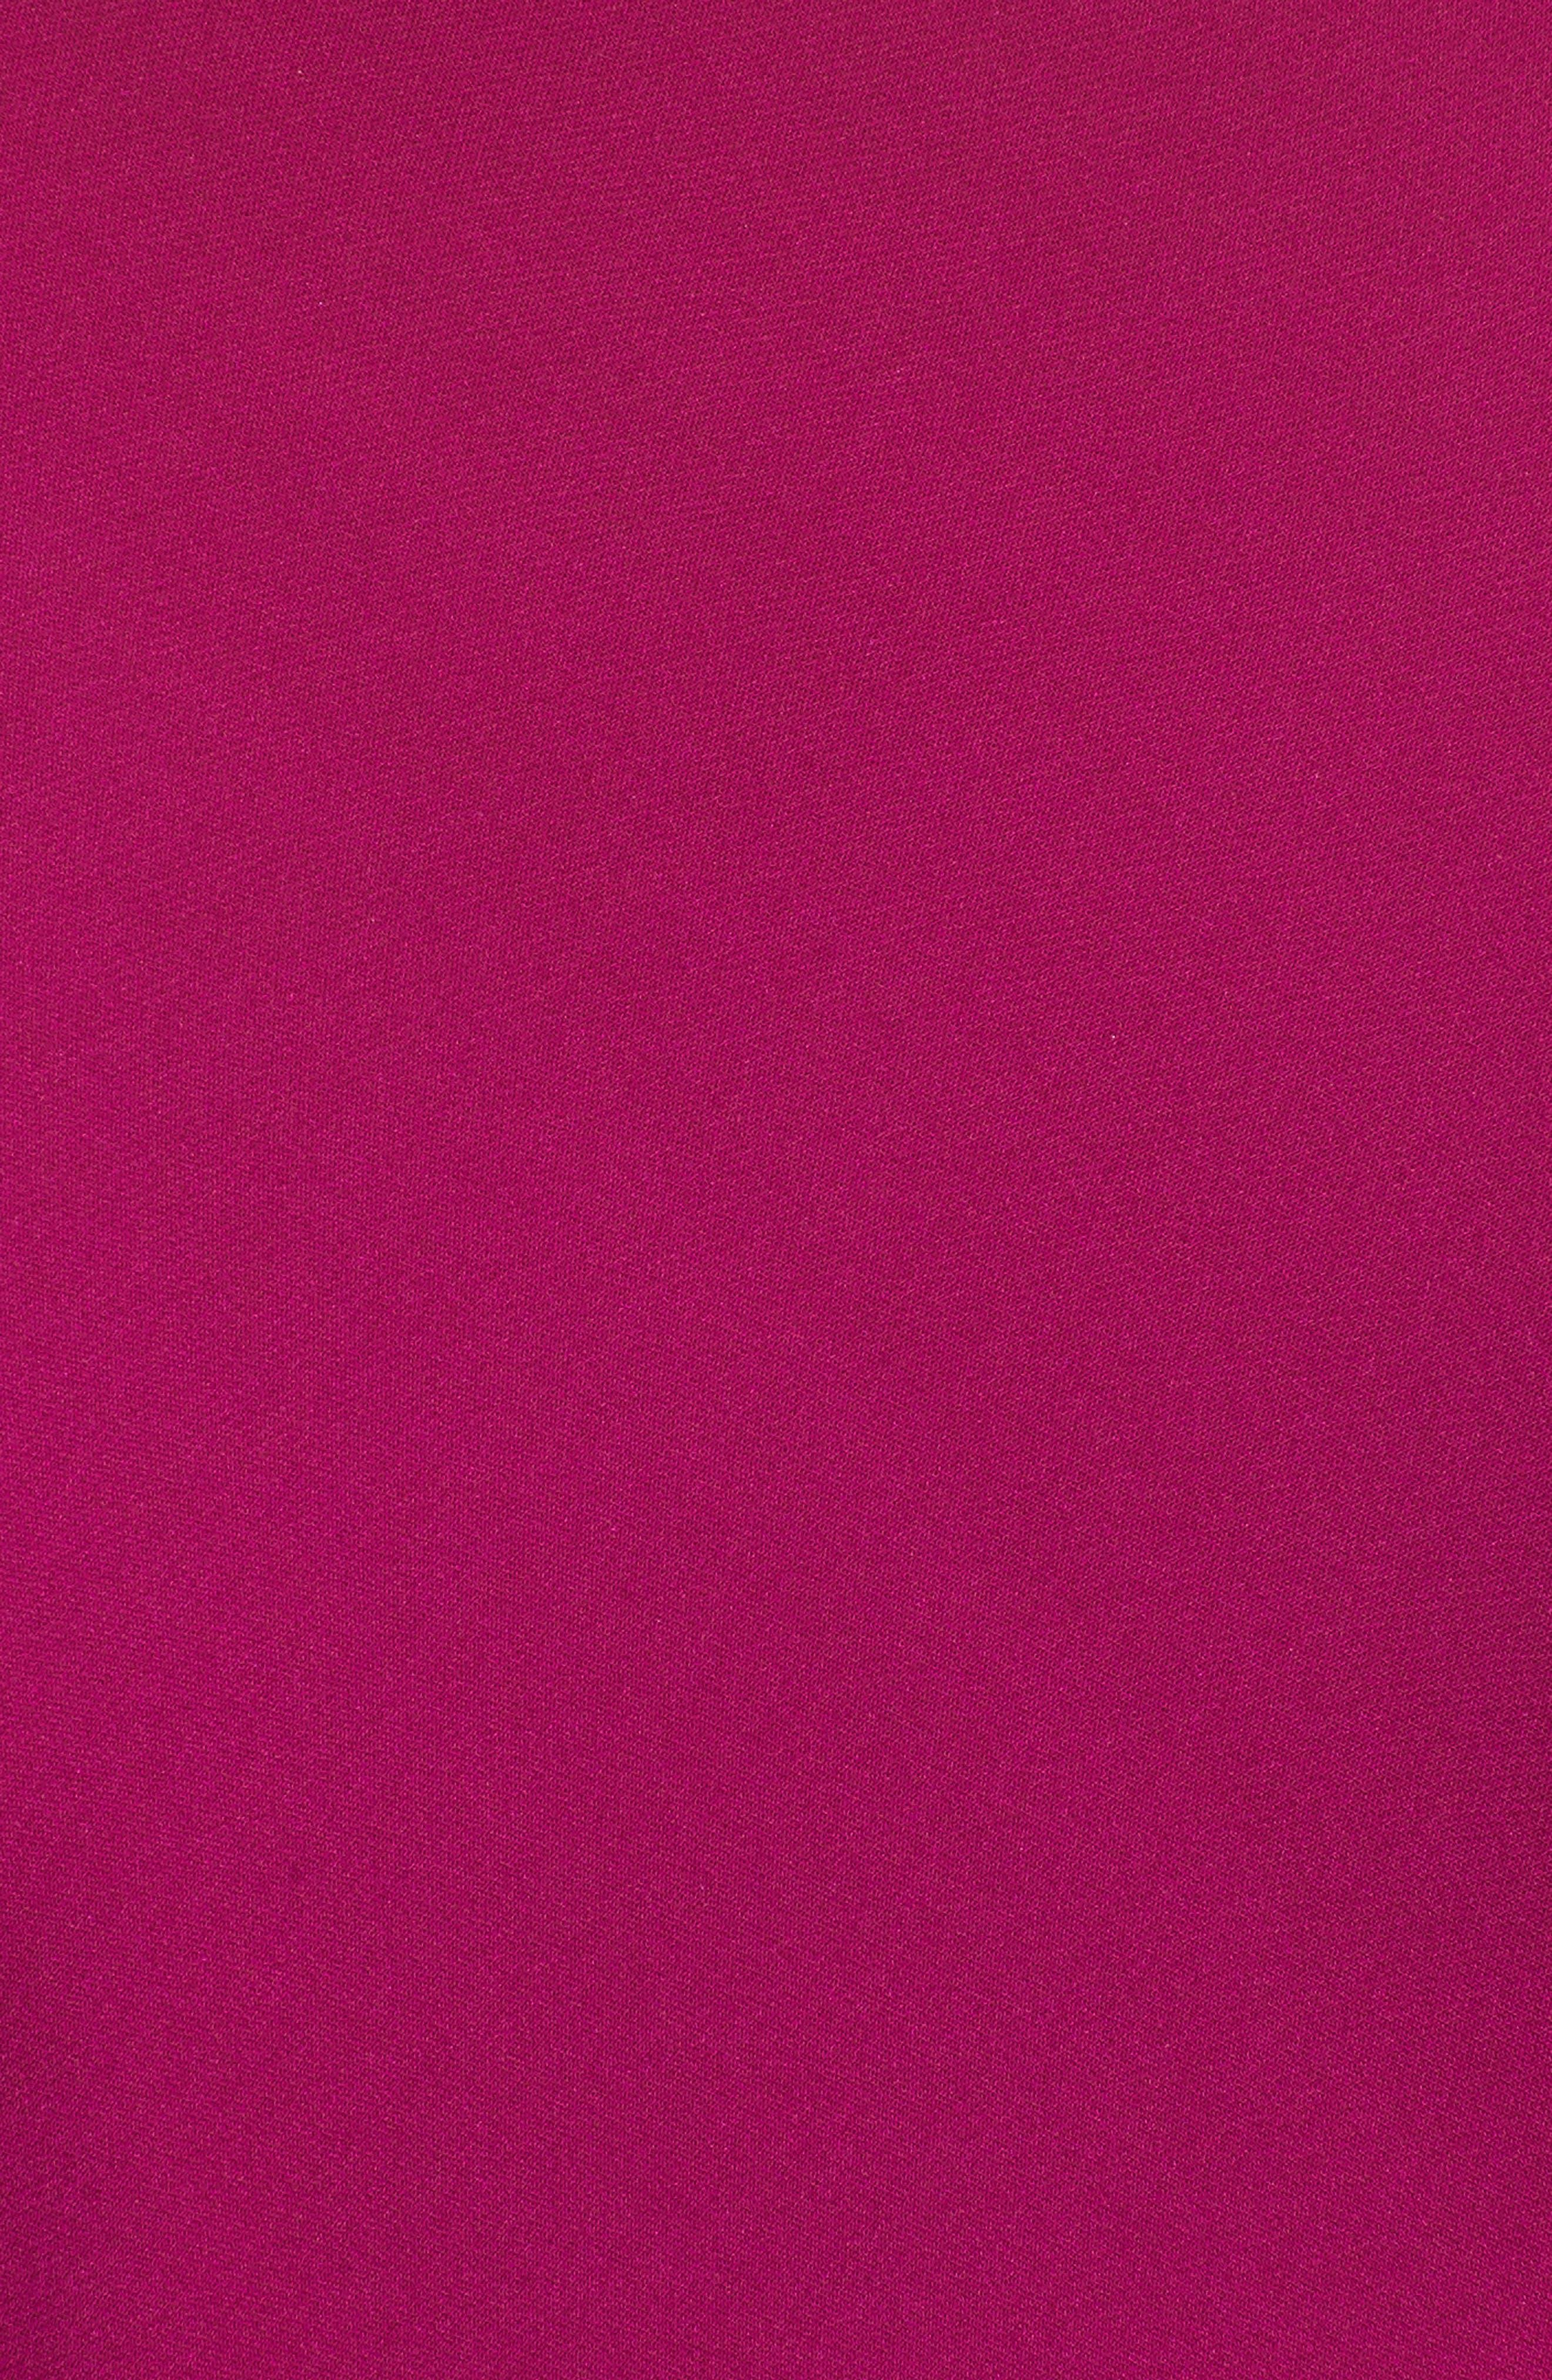 Turtleneck Bias Silk Top,                             Alternate thumbnail 5, color,                             Electric Pink